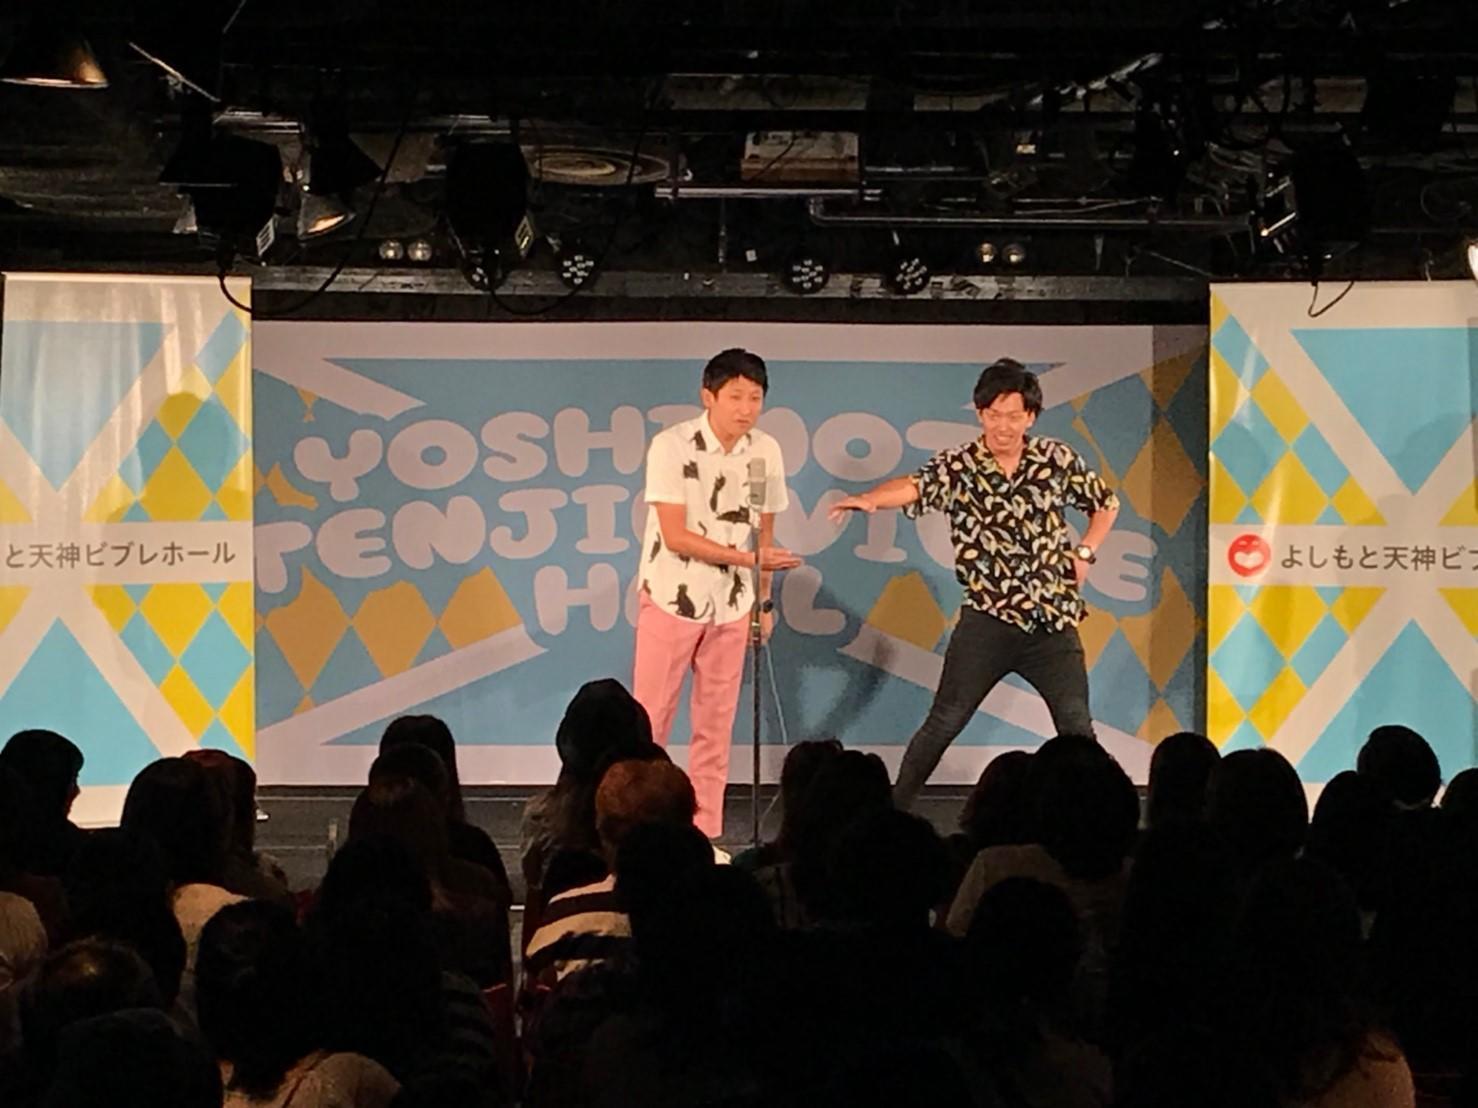 http://news.yoshimoto.co.jp/20181006174830-e76410f08beddc58c2f0436ce61ed0692afad211.jpg